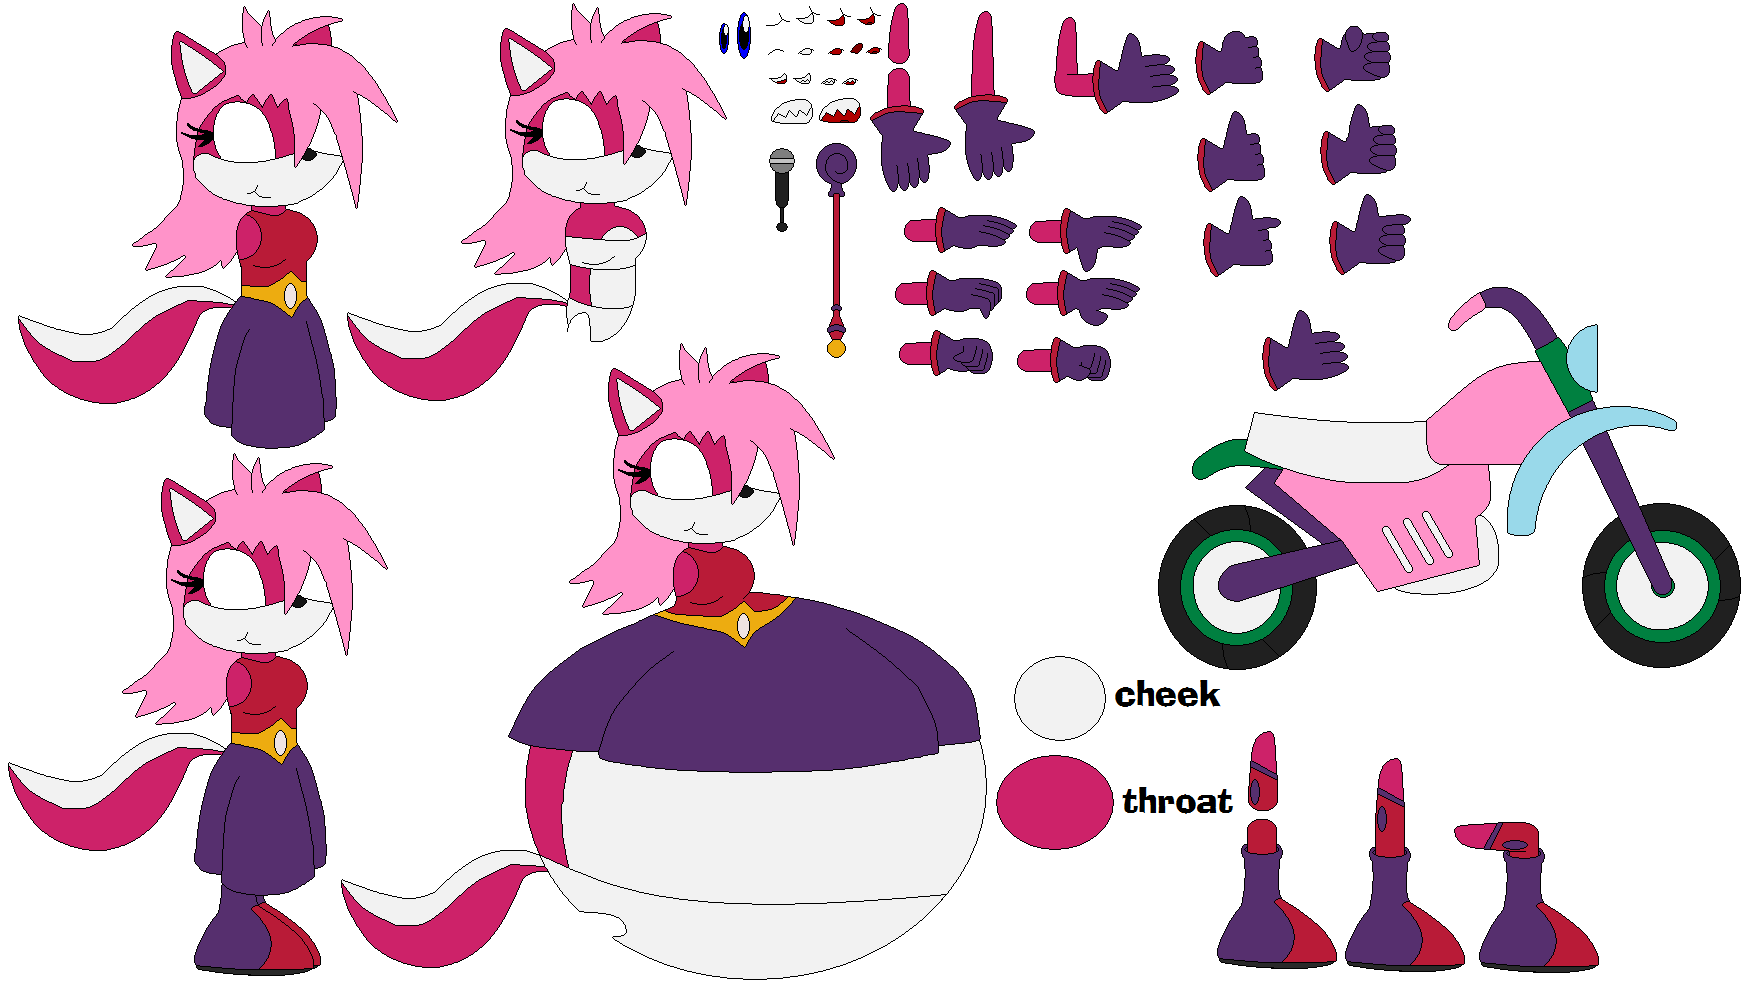 Princess Flower Redesign Builder by narutofangirlforever on DeviantArt